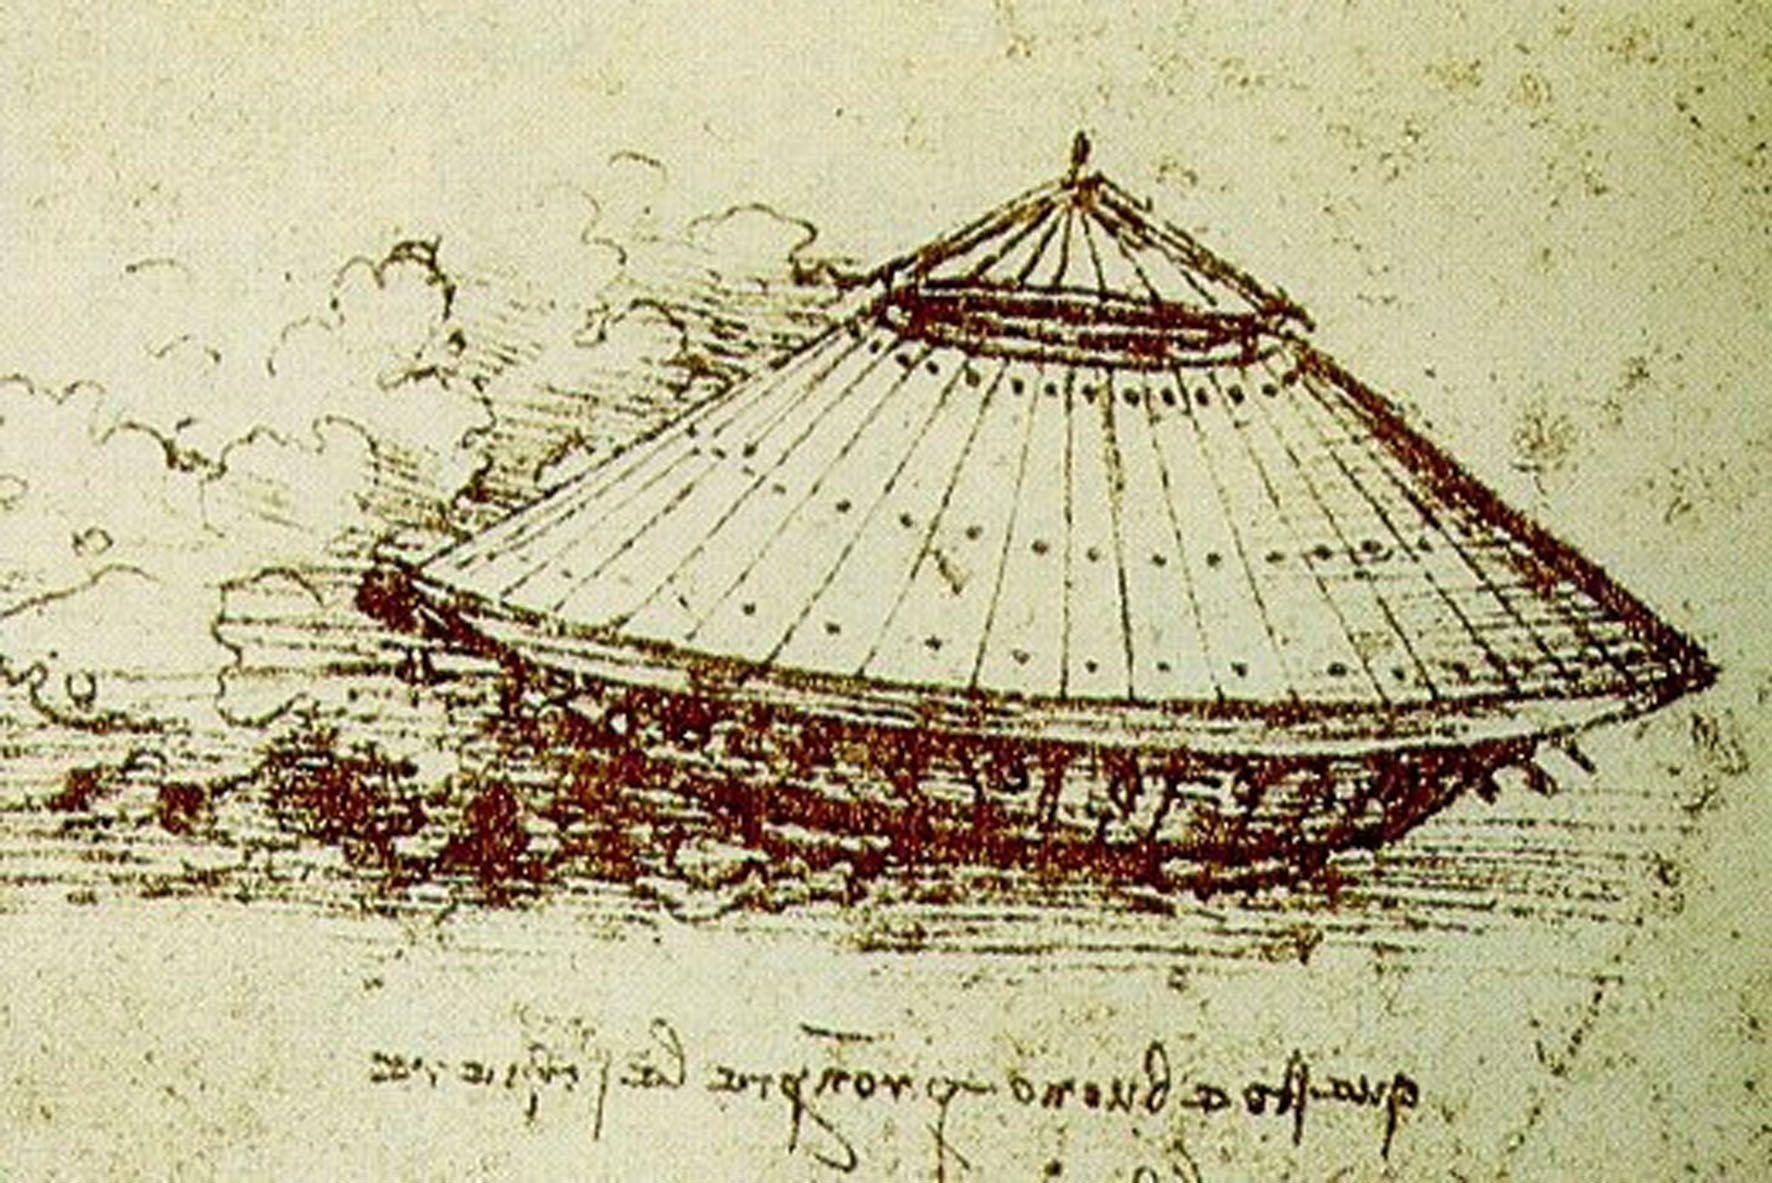 Leonardo Da Vinci Cultura Inquieta Leonardo Da Vinci Leonardo Da Vinci Inventos Renacimiento Italiano